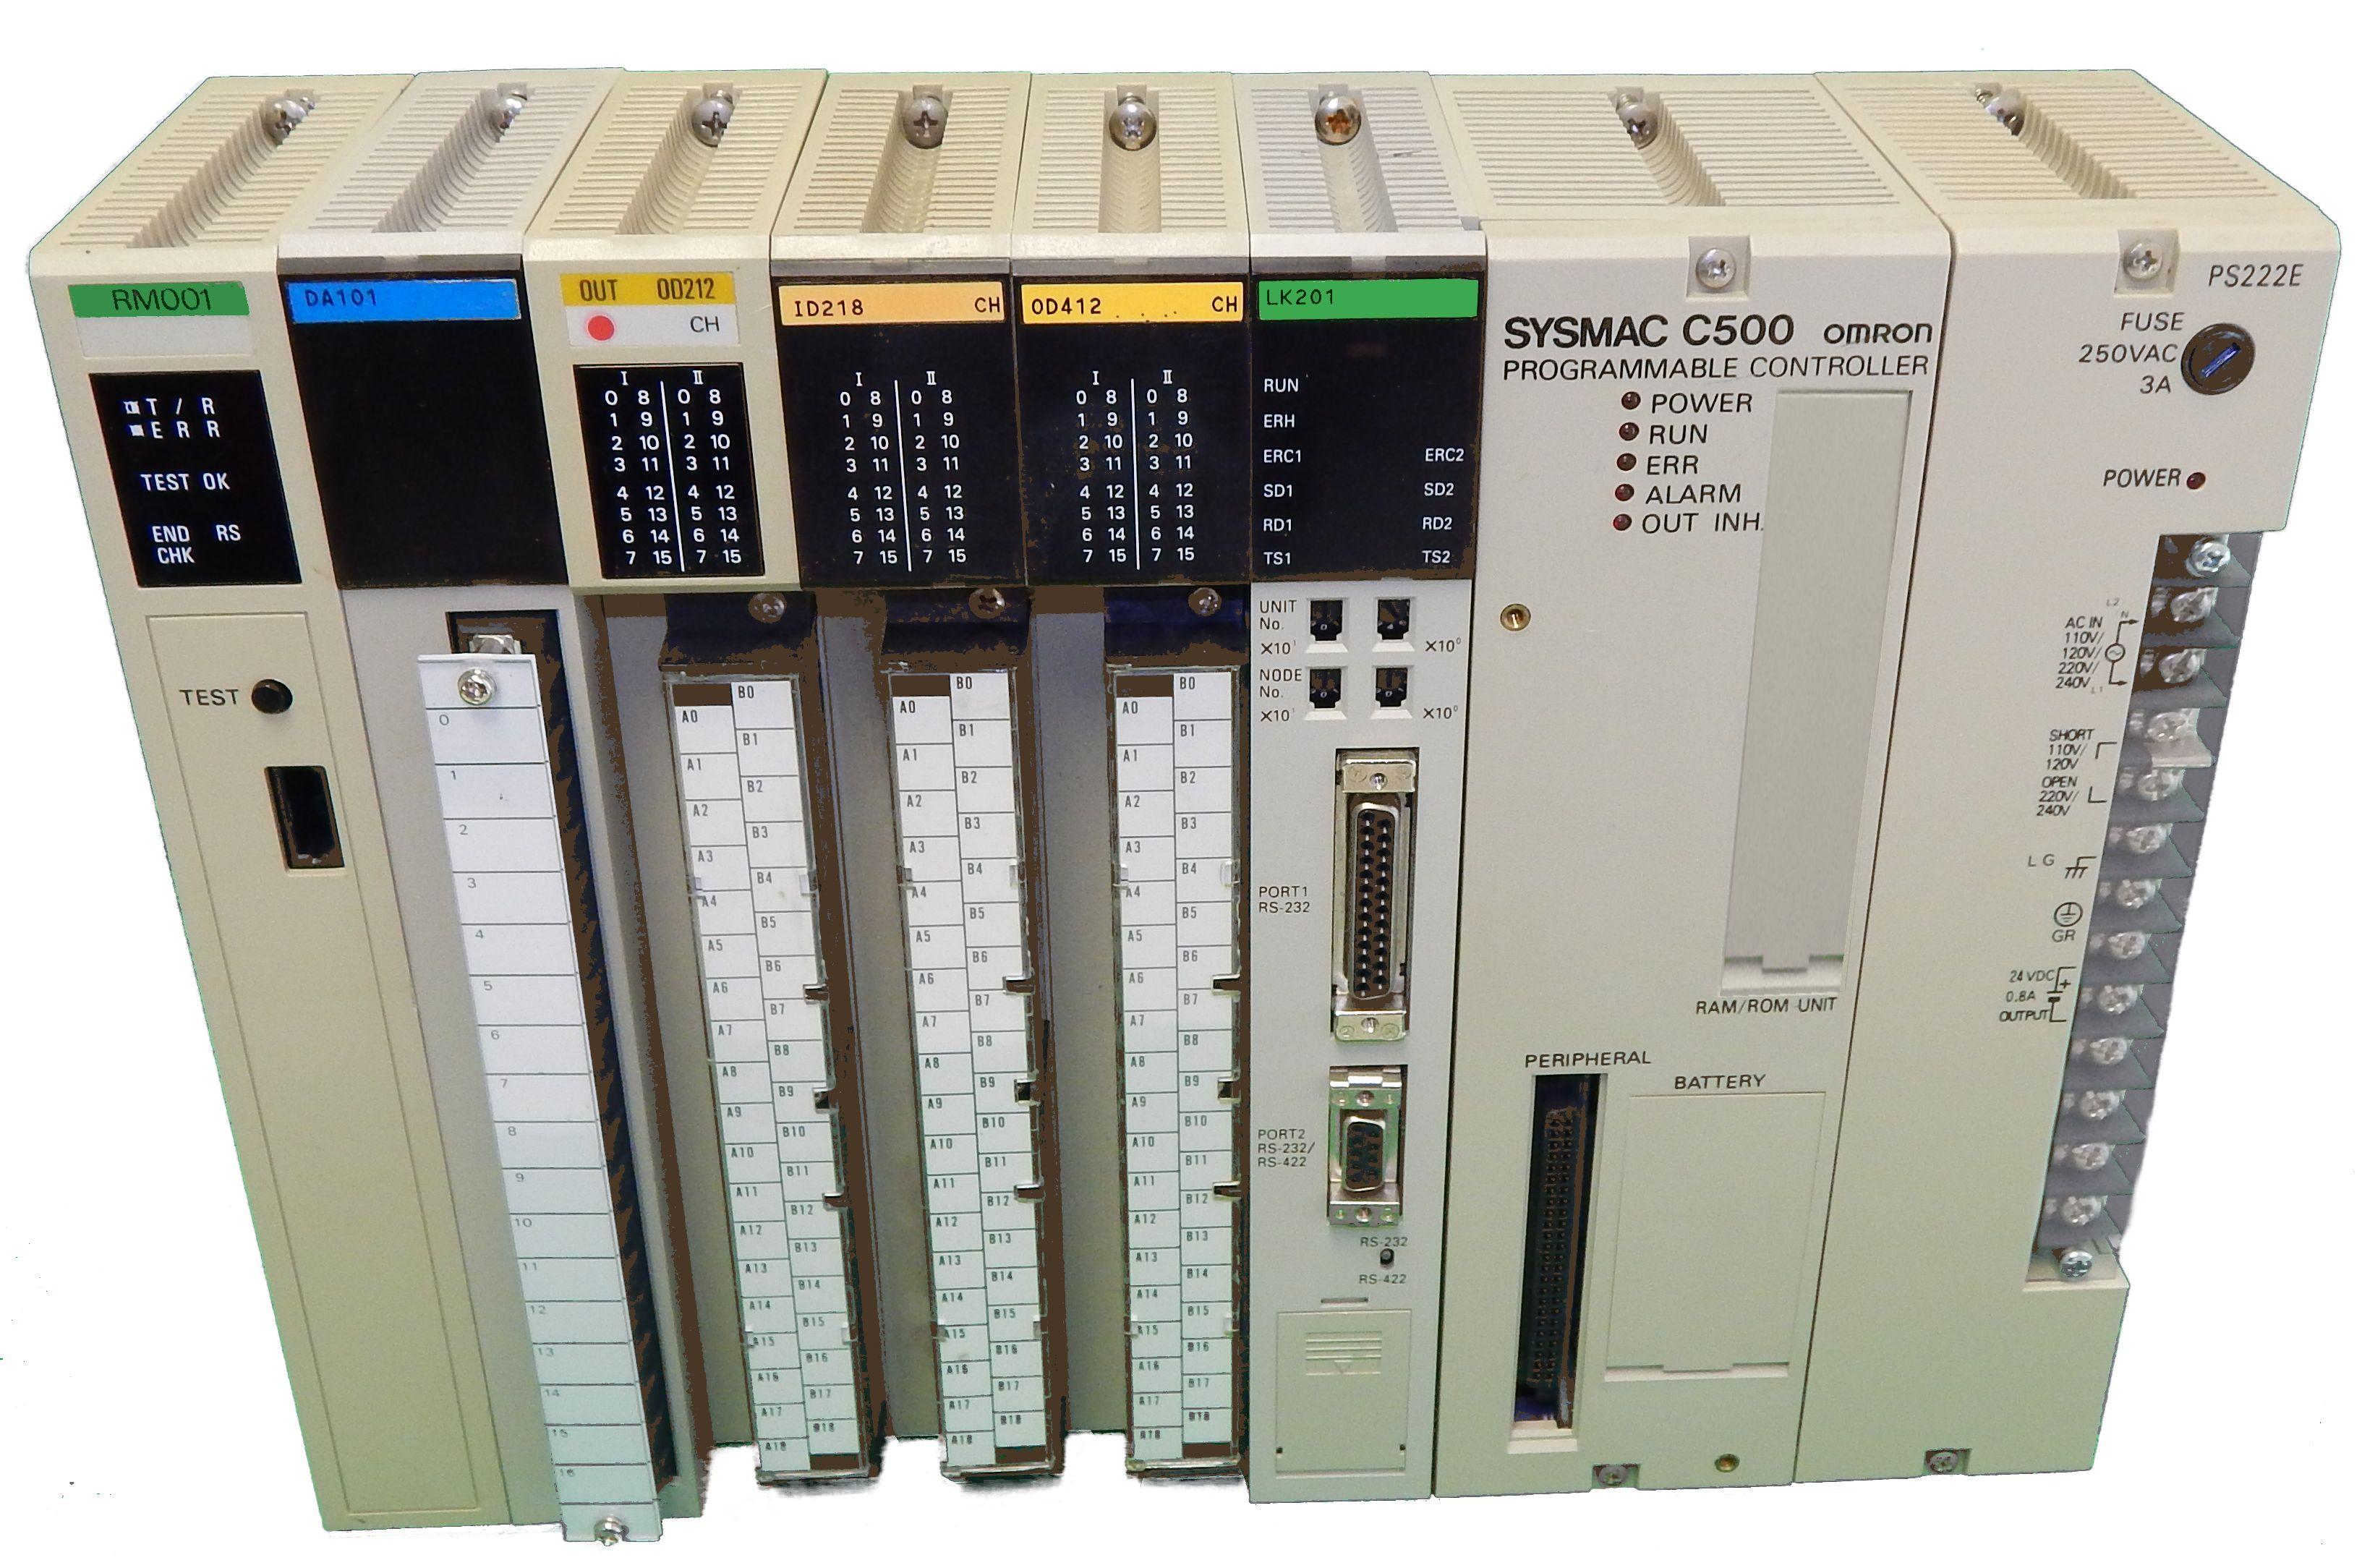 3G2C7-CPU14-E